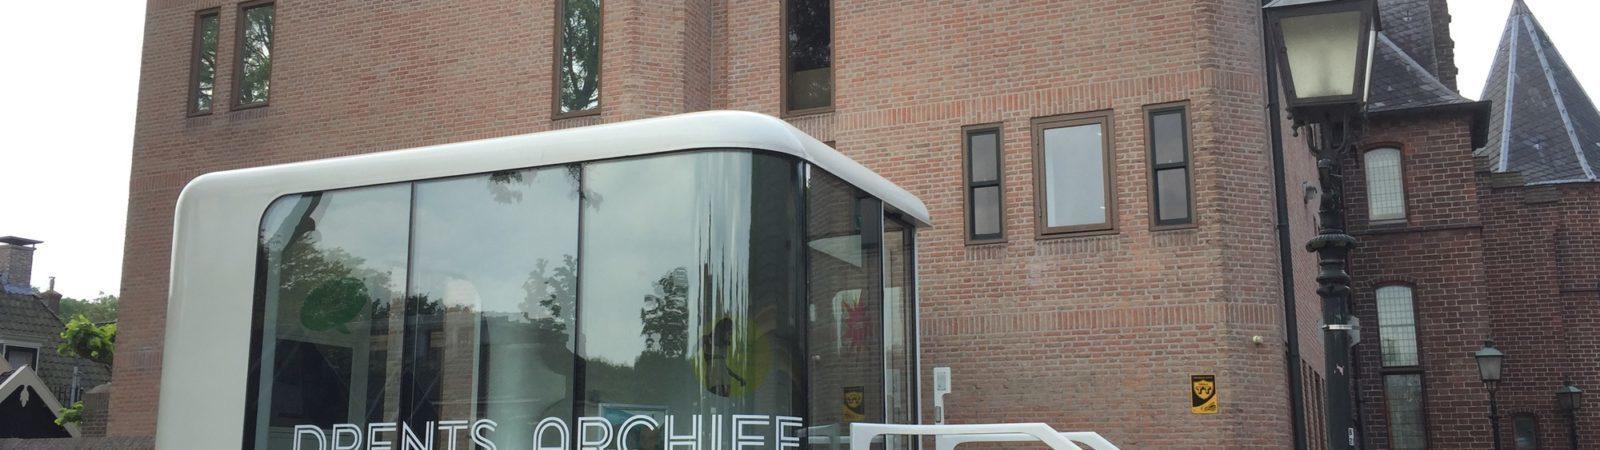 Drents Archief - Witterzomer Drenthe